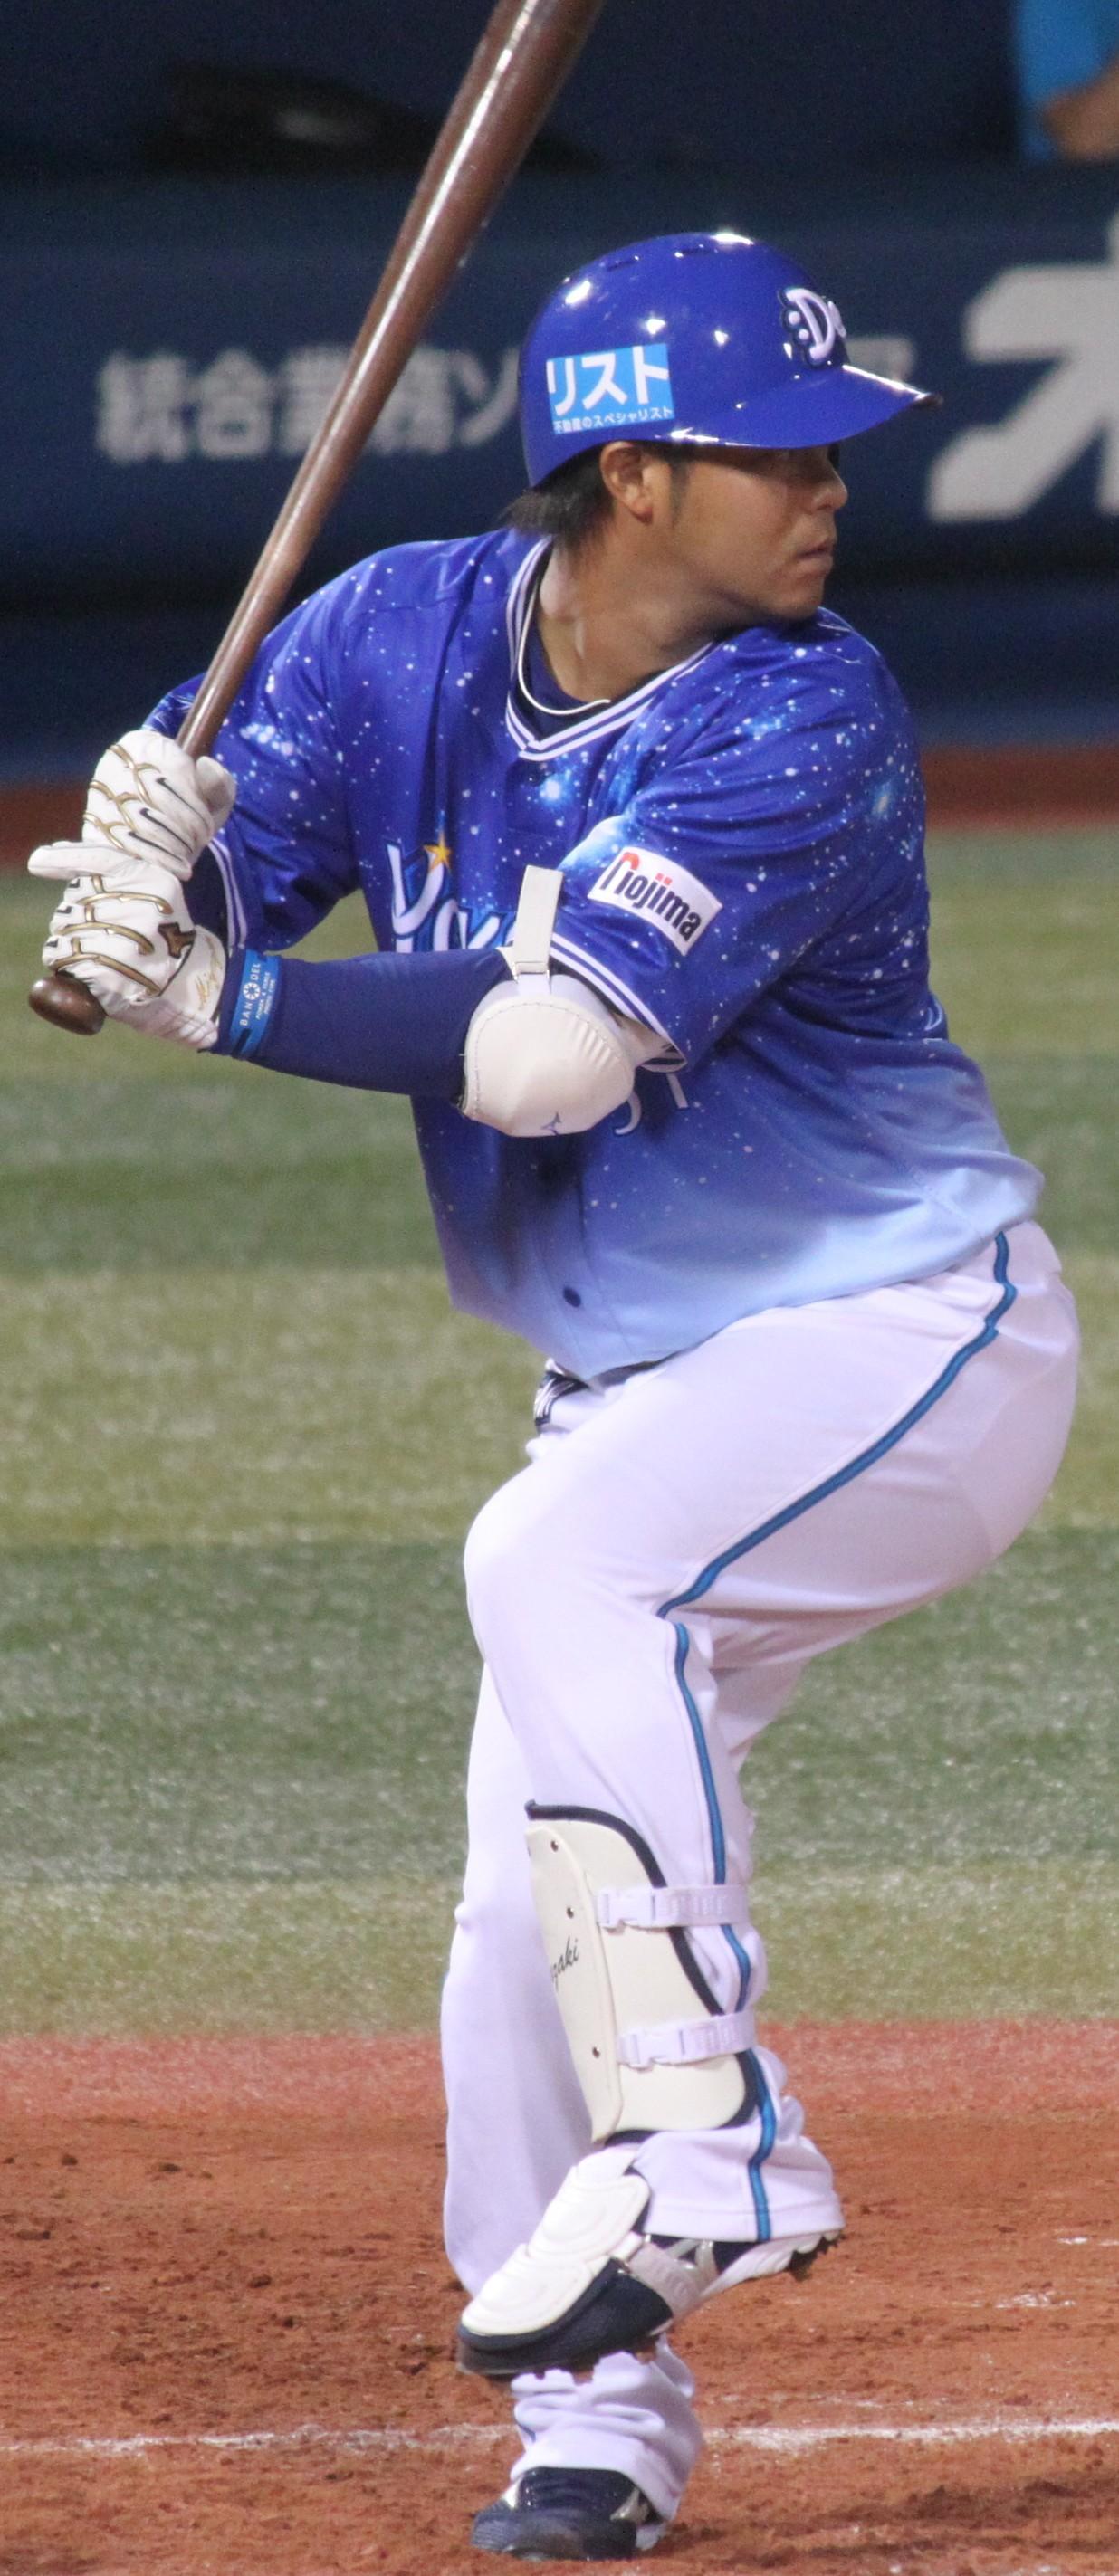 File:20130803 Tosiro Miyazaki, infielder of the Yokohama DeNA ...